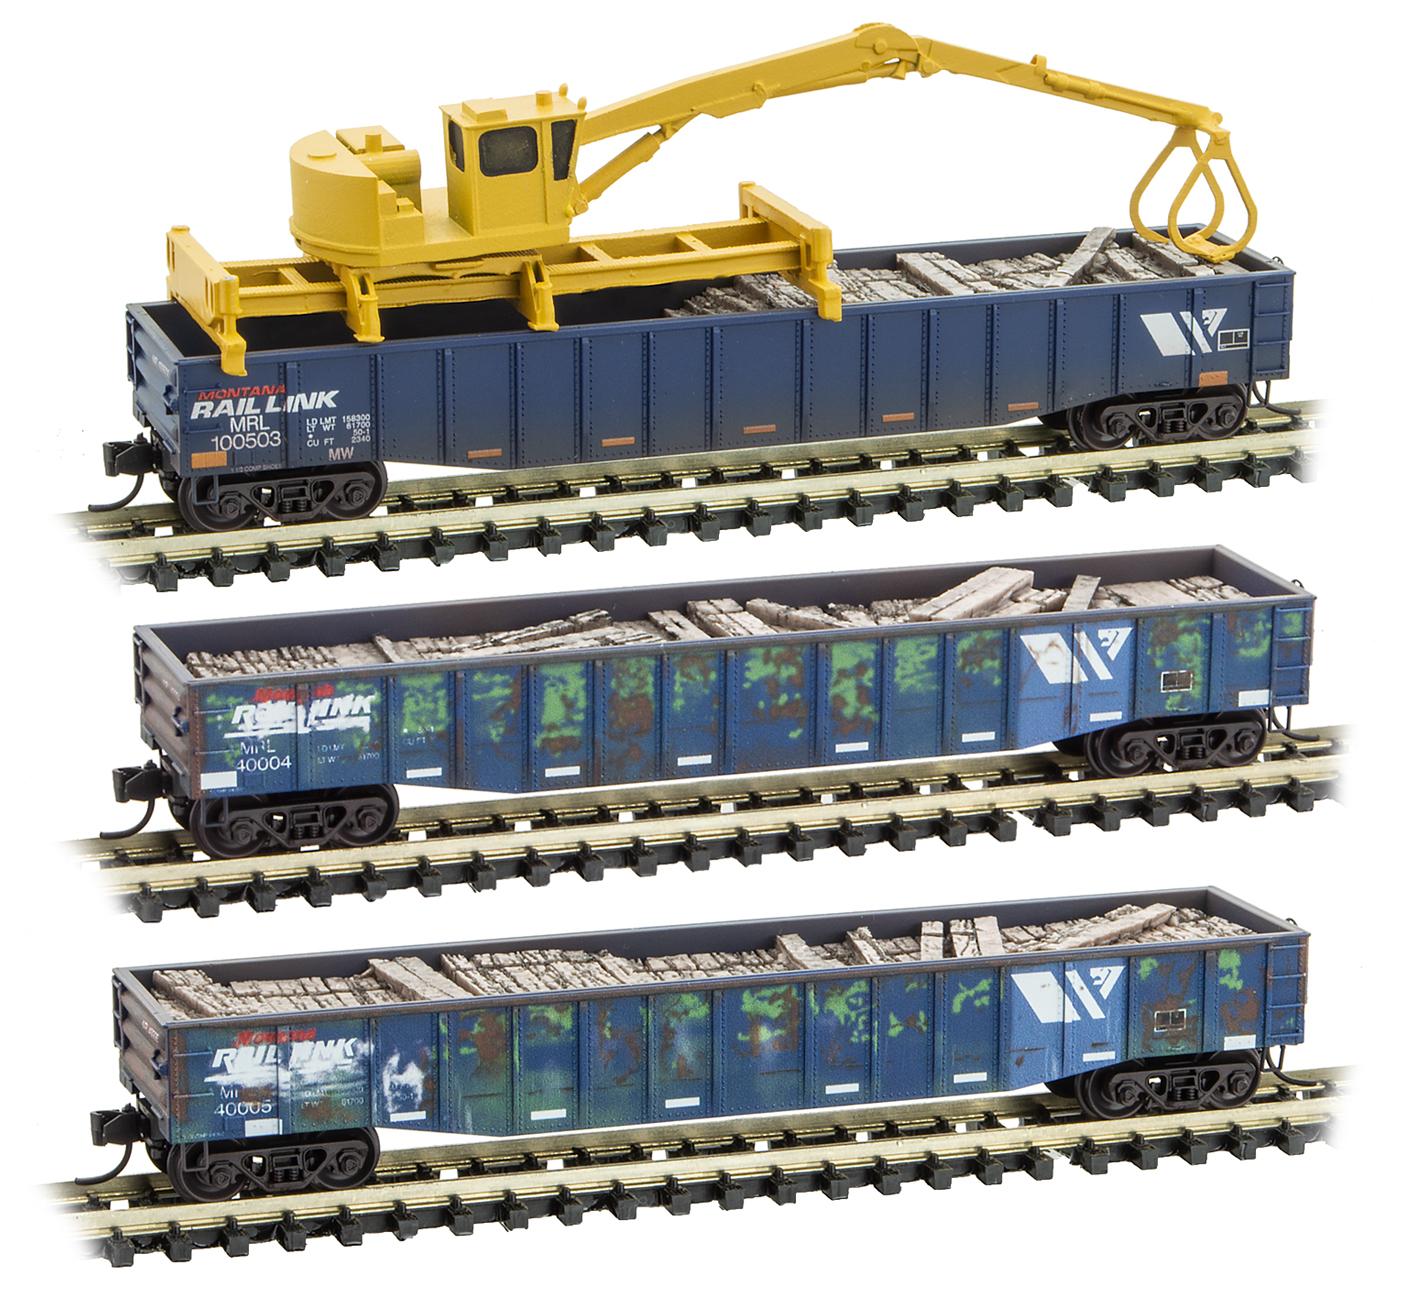 N Scale - Micro-Trains - 993 02 030 - Maintenance of Way Equipment - Montana Rail Link - 3-Pack